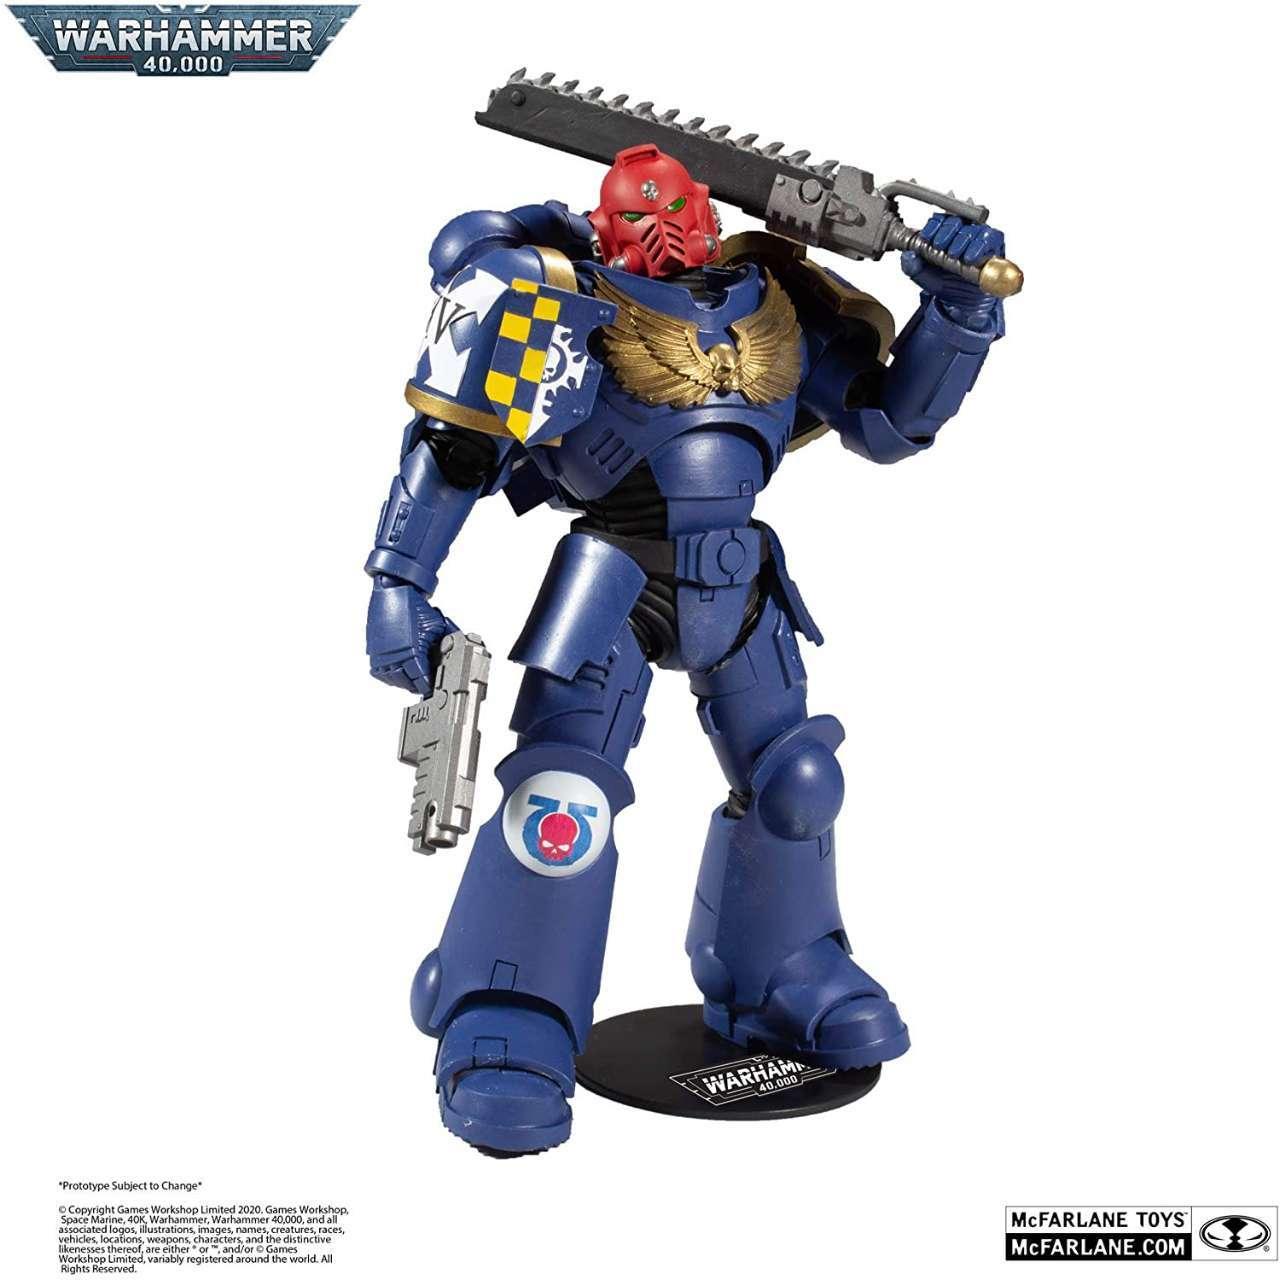 mcfarlane-warhammer-4000071dJoUl7oNL._AC_SL1500_